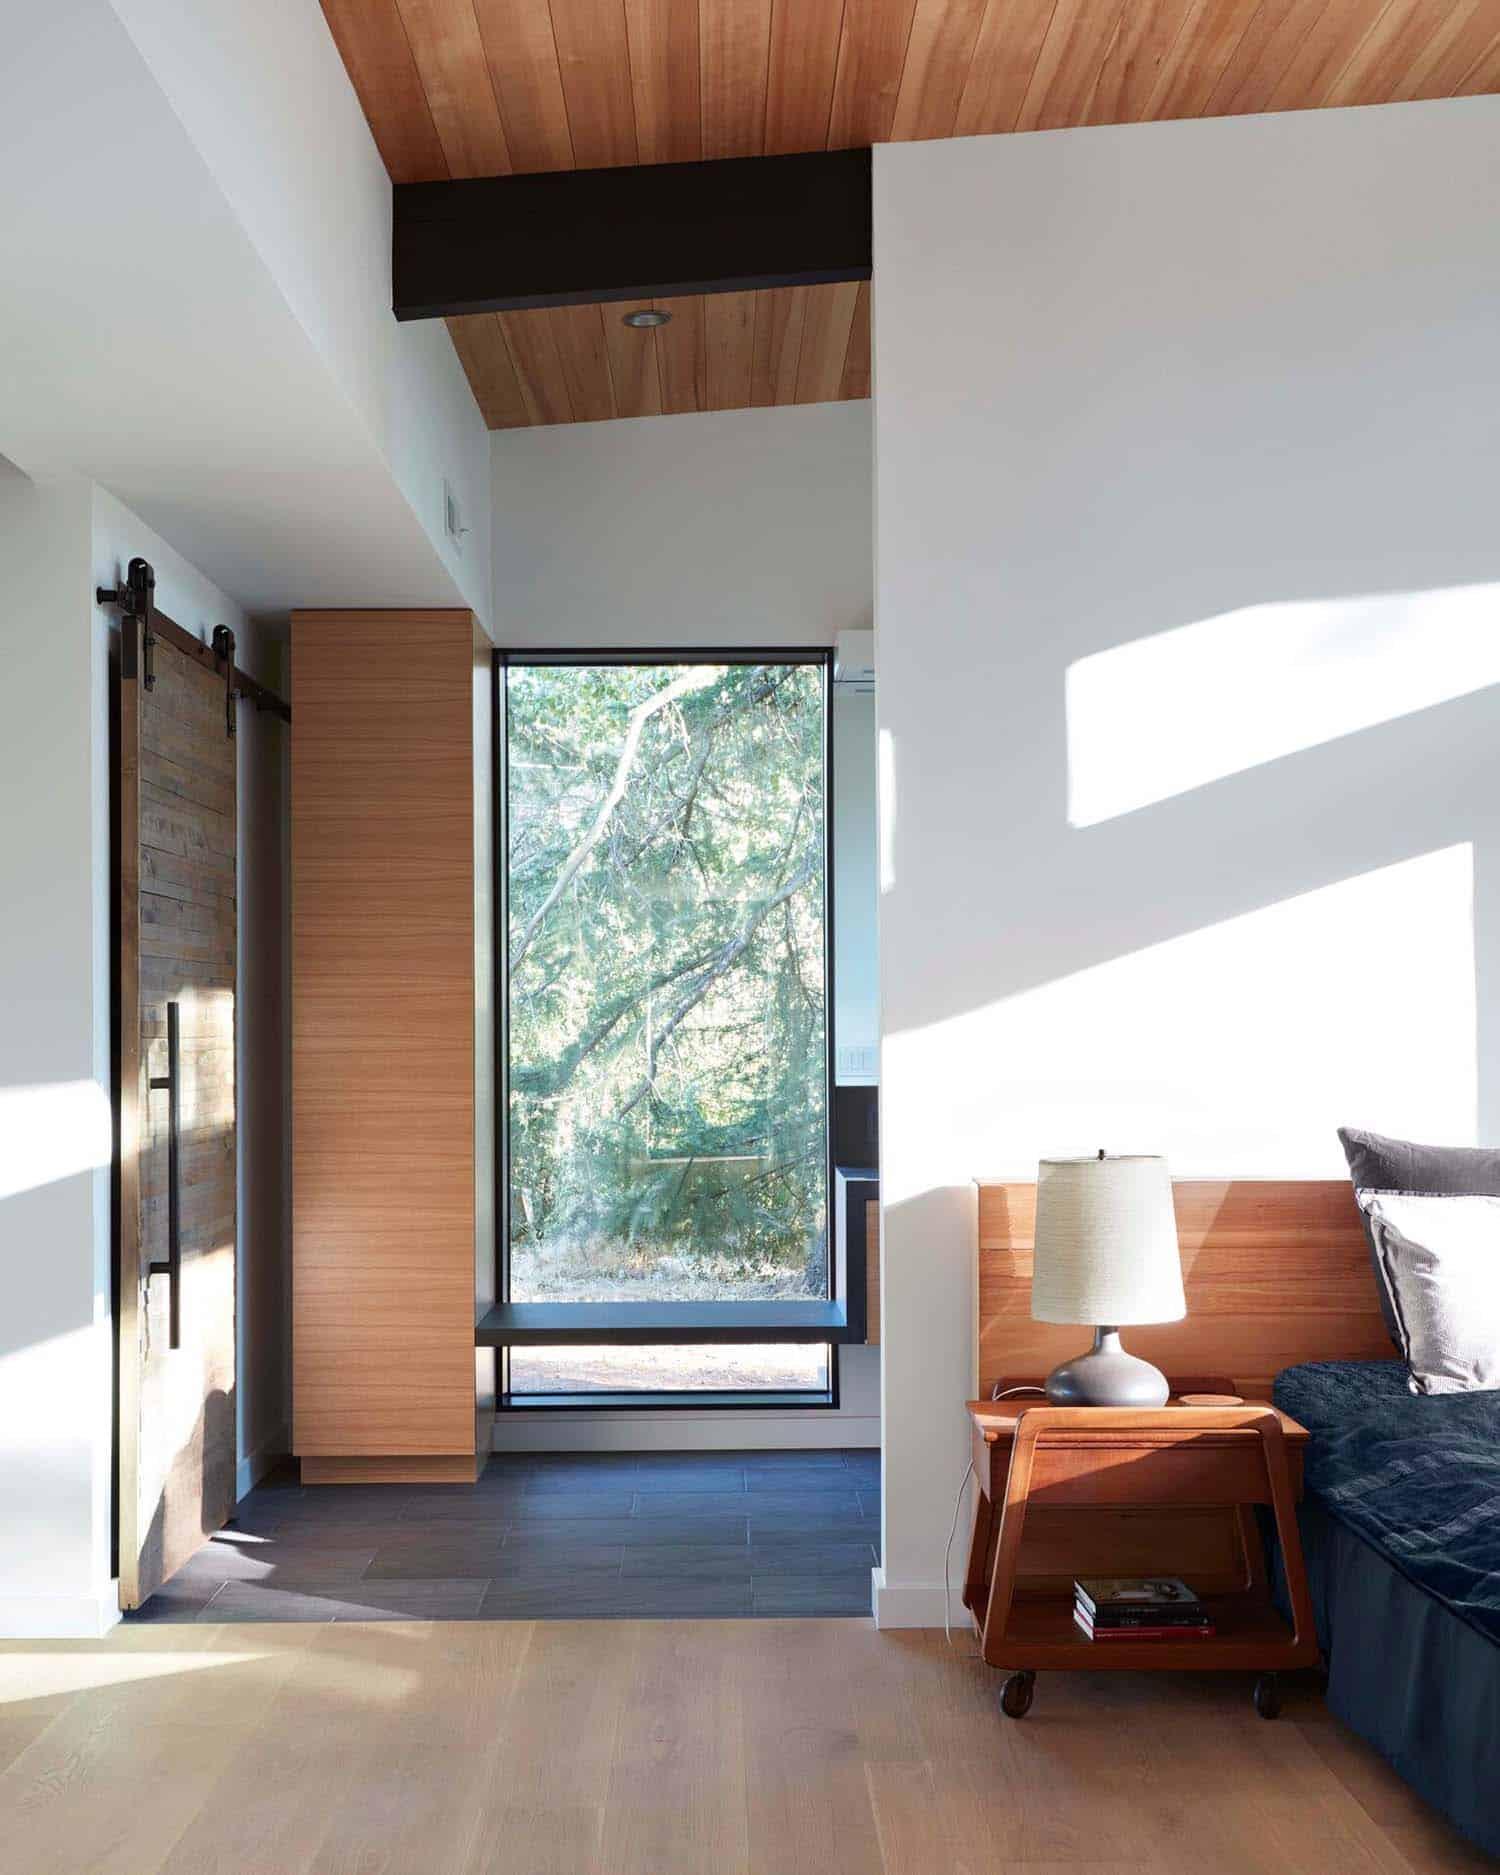 Sacramento Modern Residence-Klopf Architecture-13-1 Kindesign